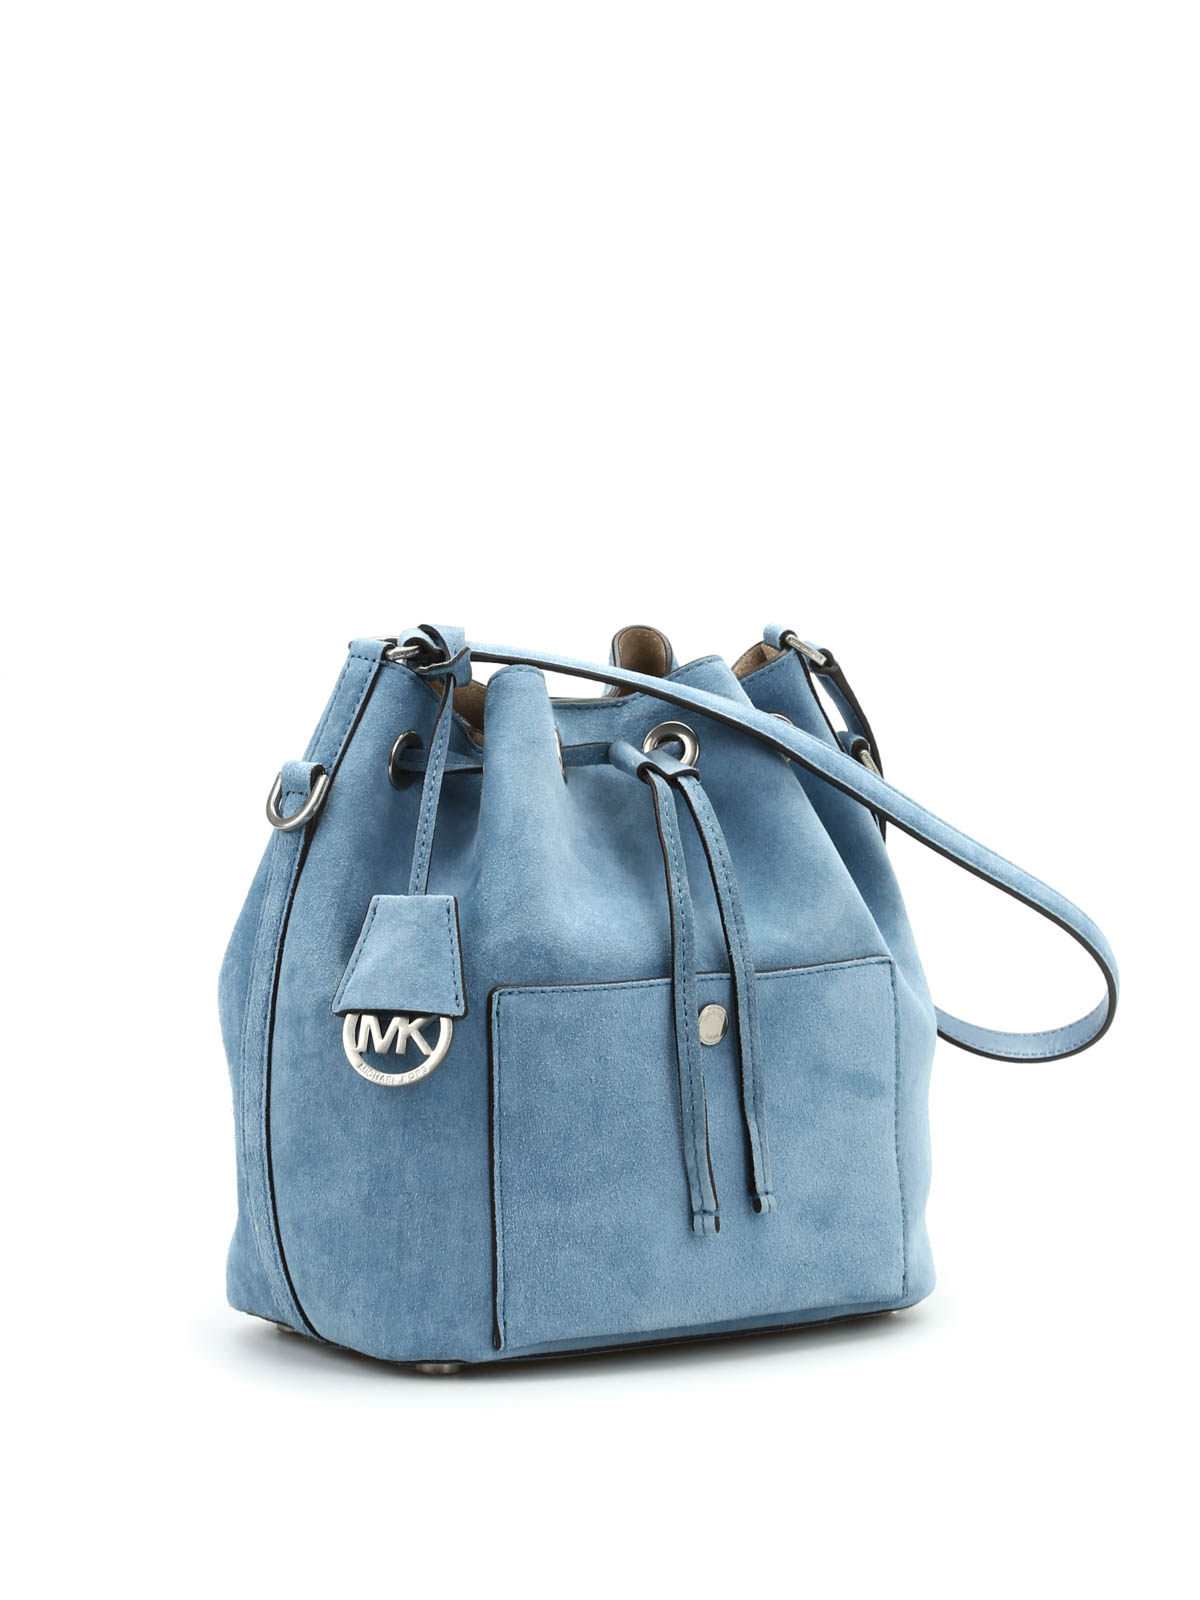 Michael Kors Greenwich Suede Bucket Bag Bags 30h5tgrm2s Authentic Online